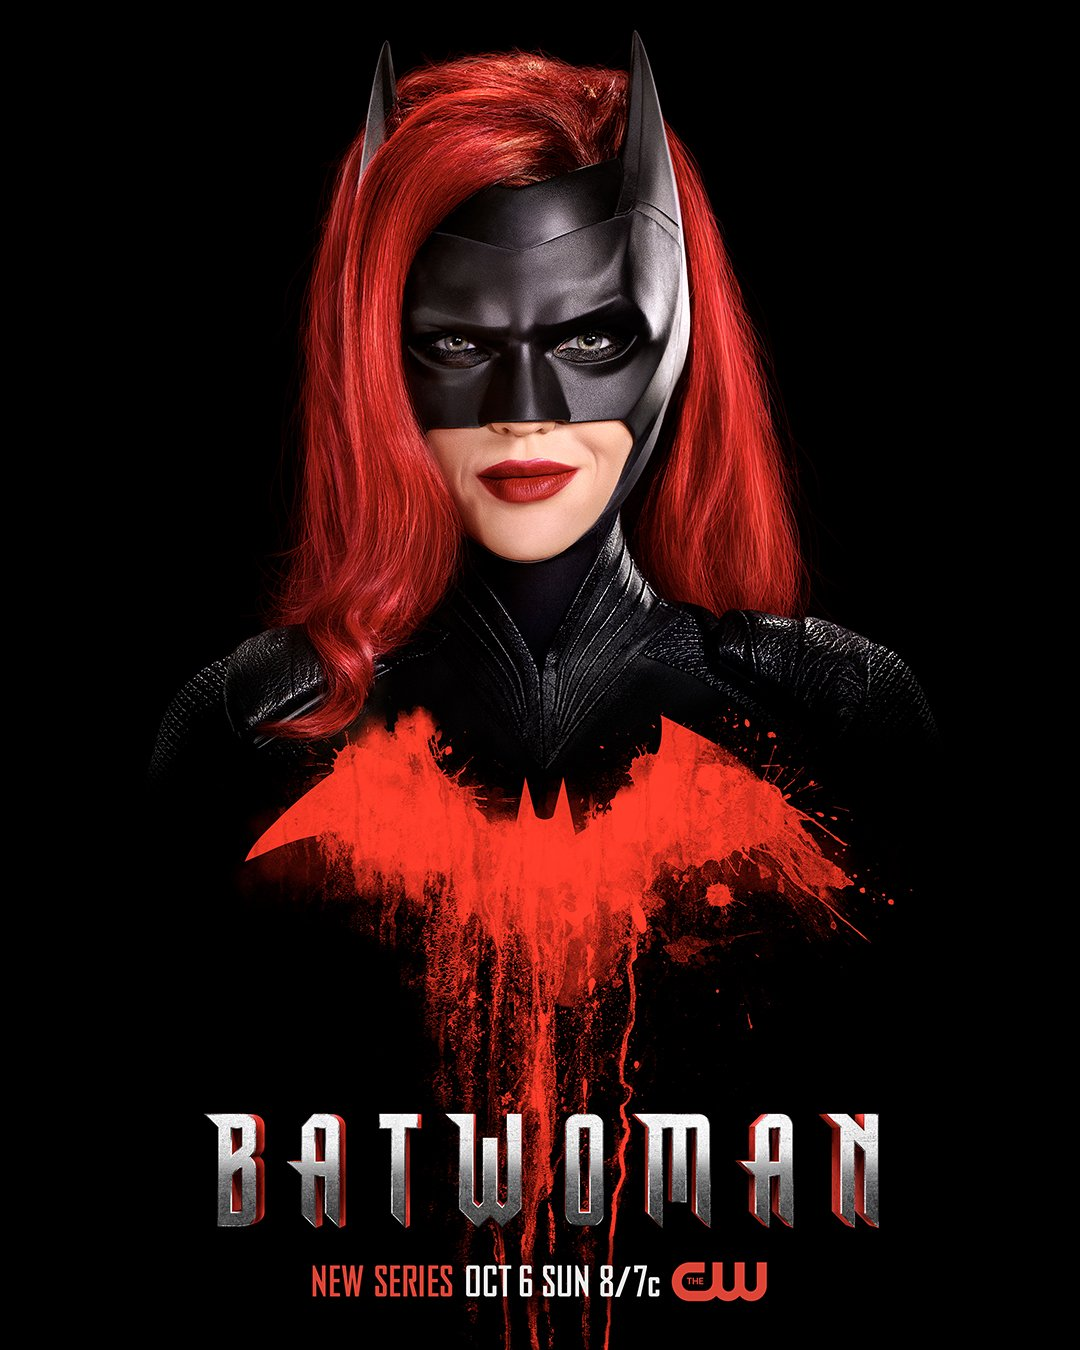 Póster de Batwoman en The CW. Imagen: Batwoman Twitter (@CWBatwoman).